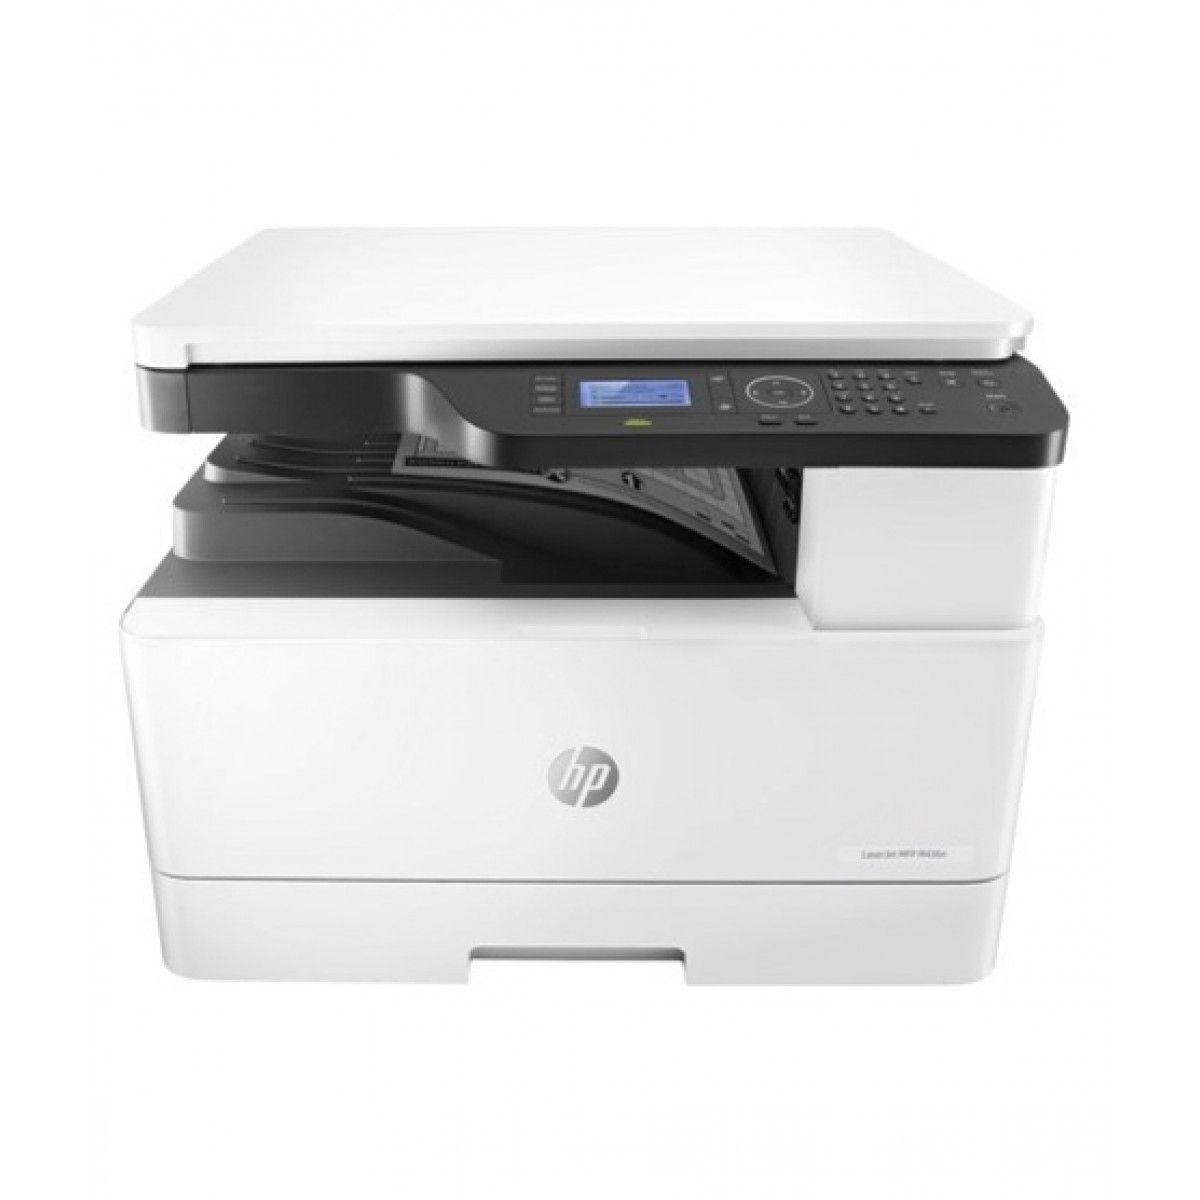 HP LaserJet Pro M436dn Multifunction Printer 2KY38A